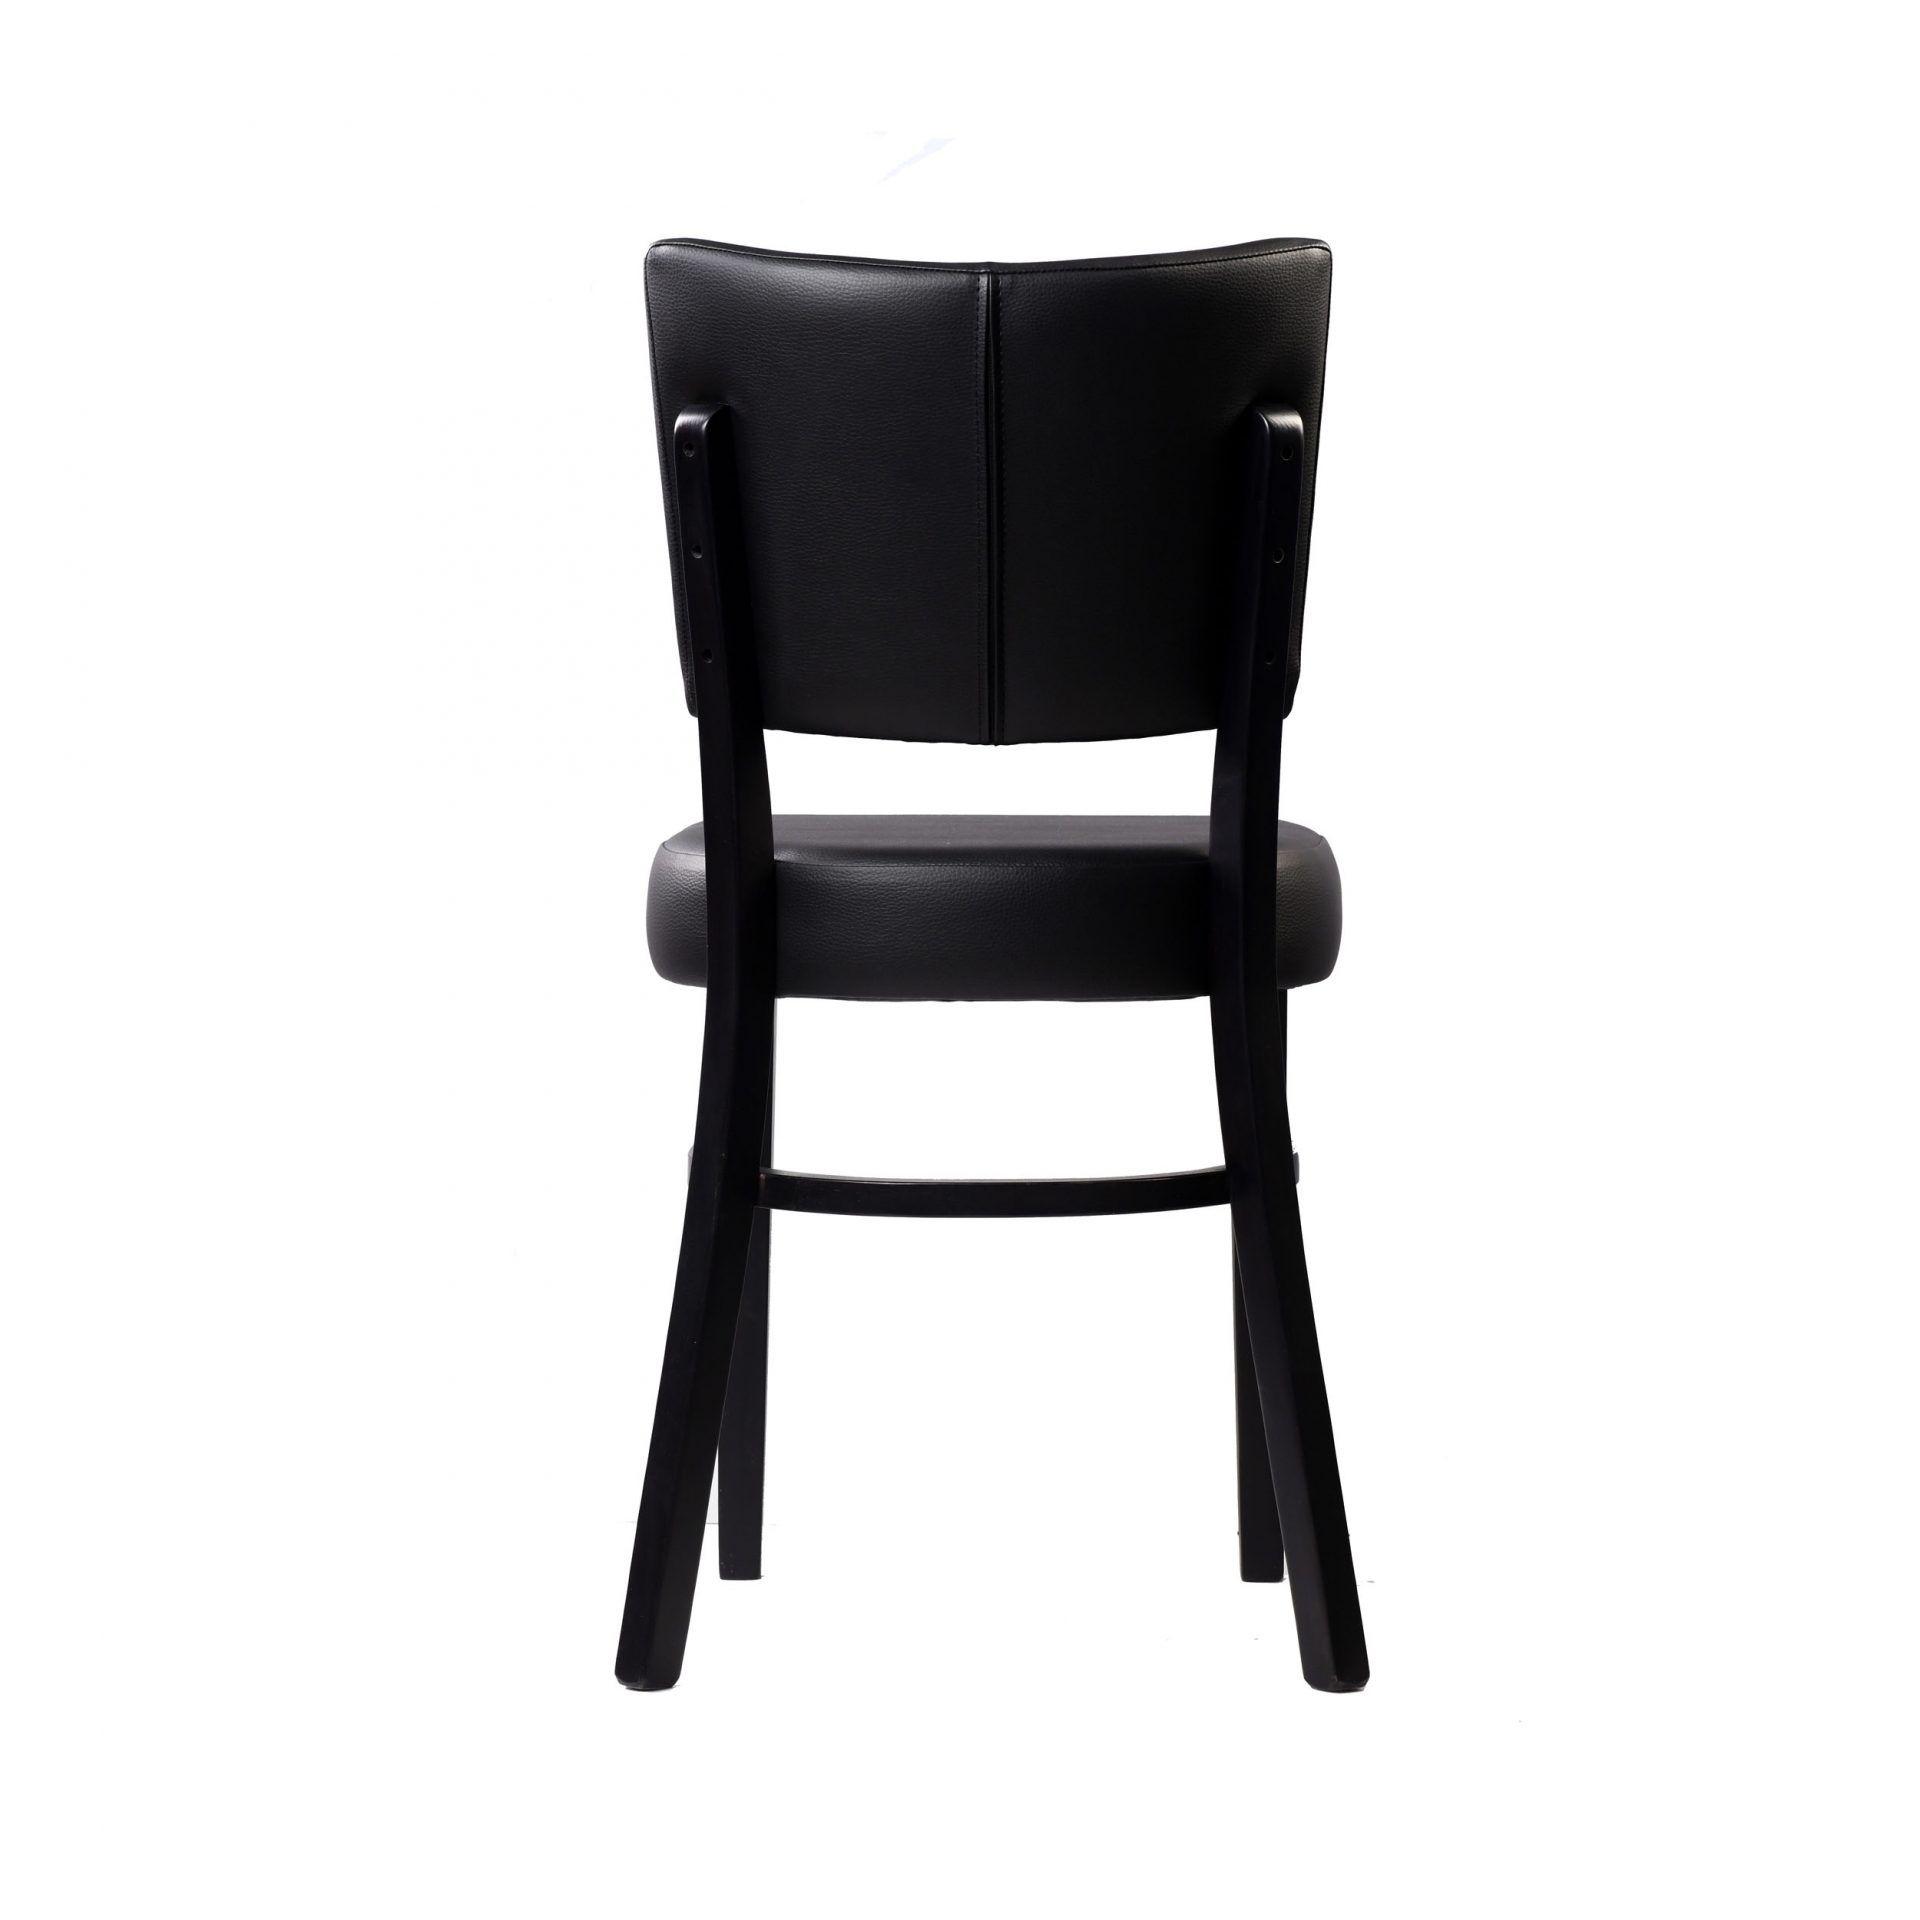 memphis chair black vinyl seat and backrest wenge frame back